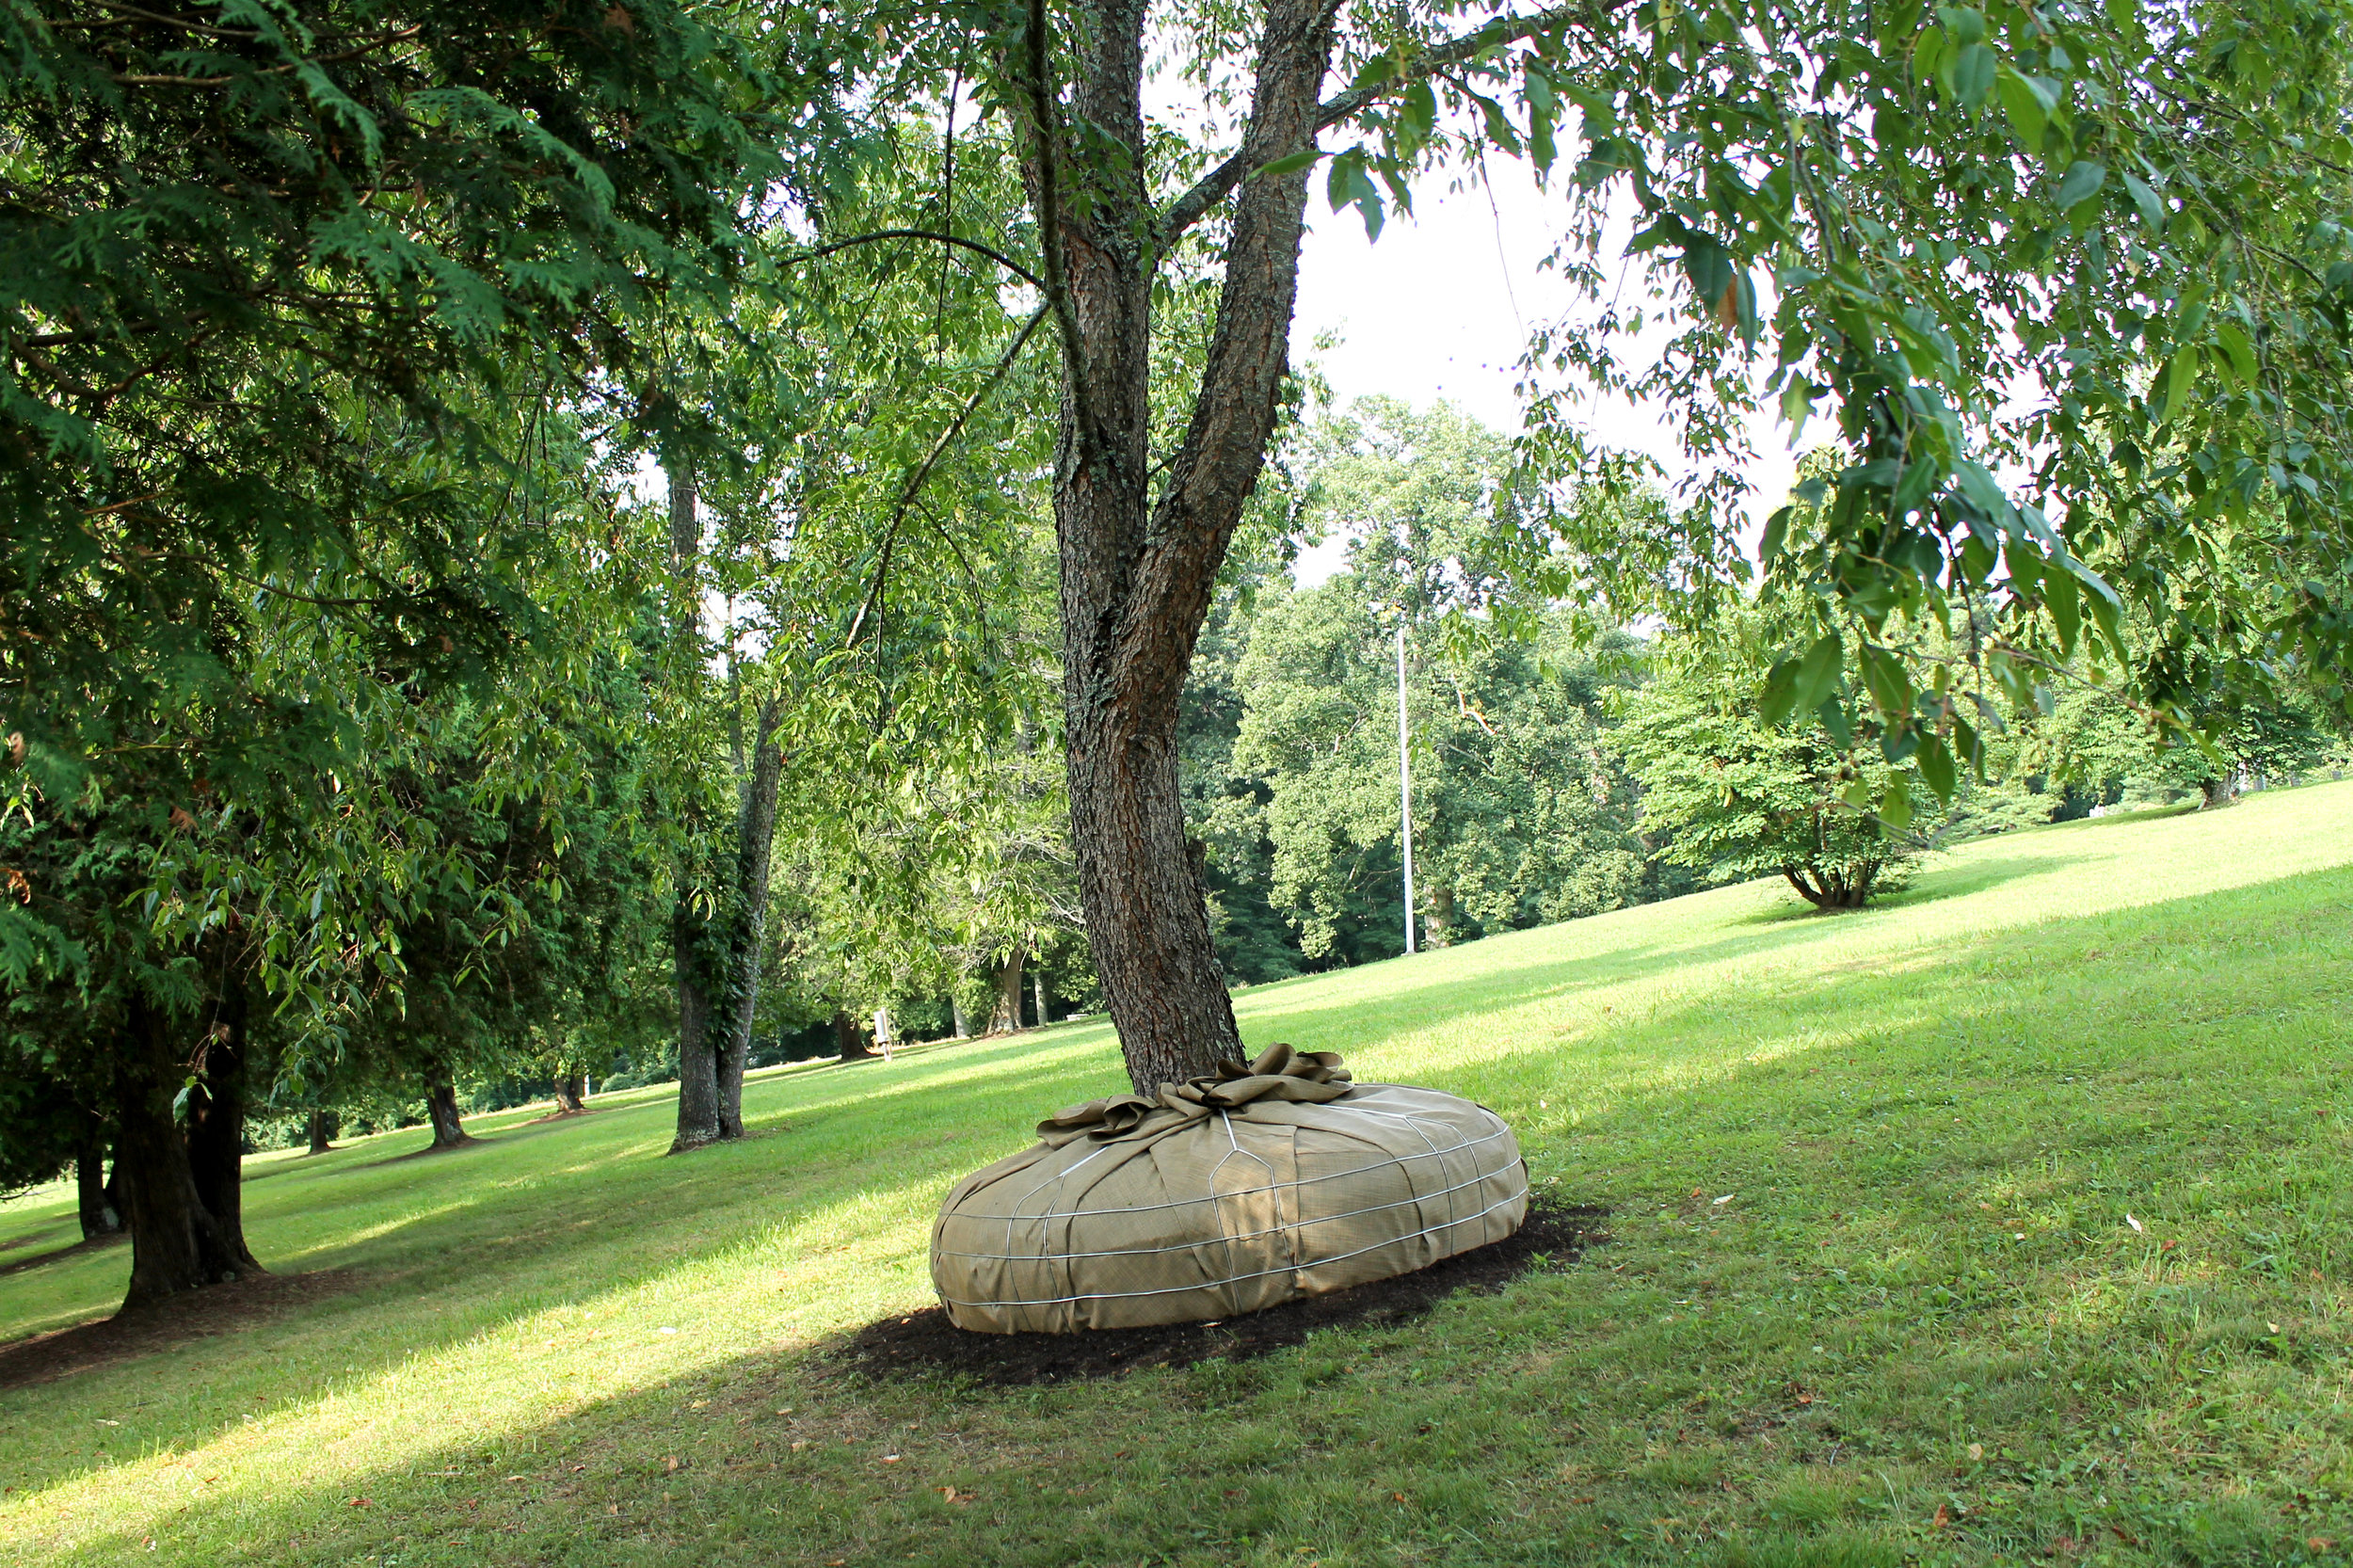 In-Transit  / 2016-19 / Steel, vinyl, rope, soil, preexisting cherry tree / 1.5' x 6.5' x 6.5'(base)